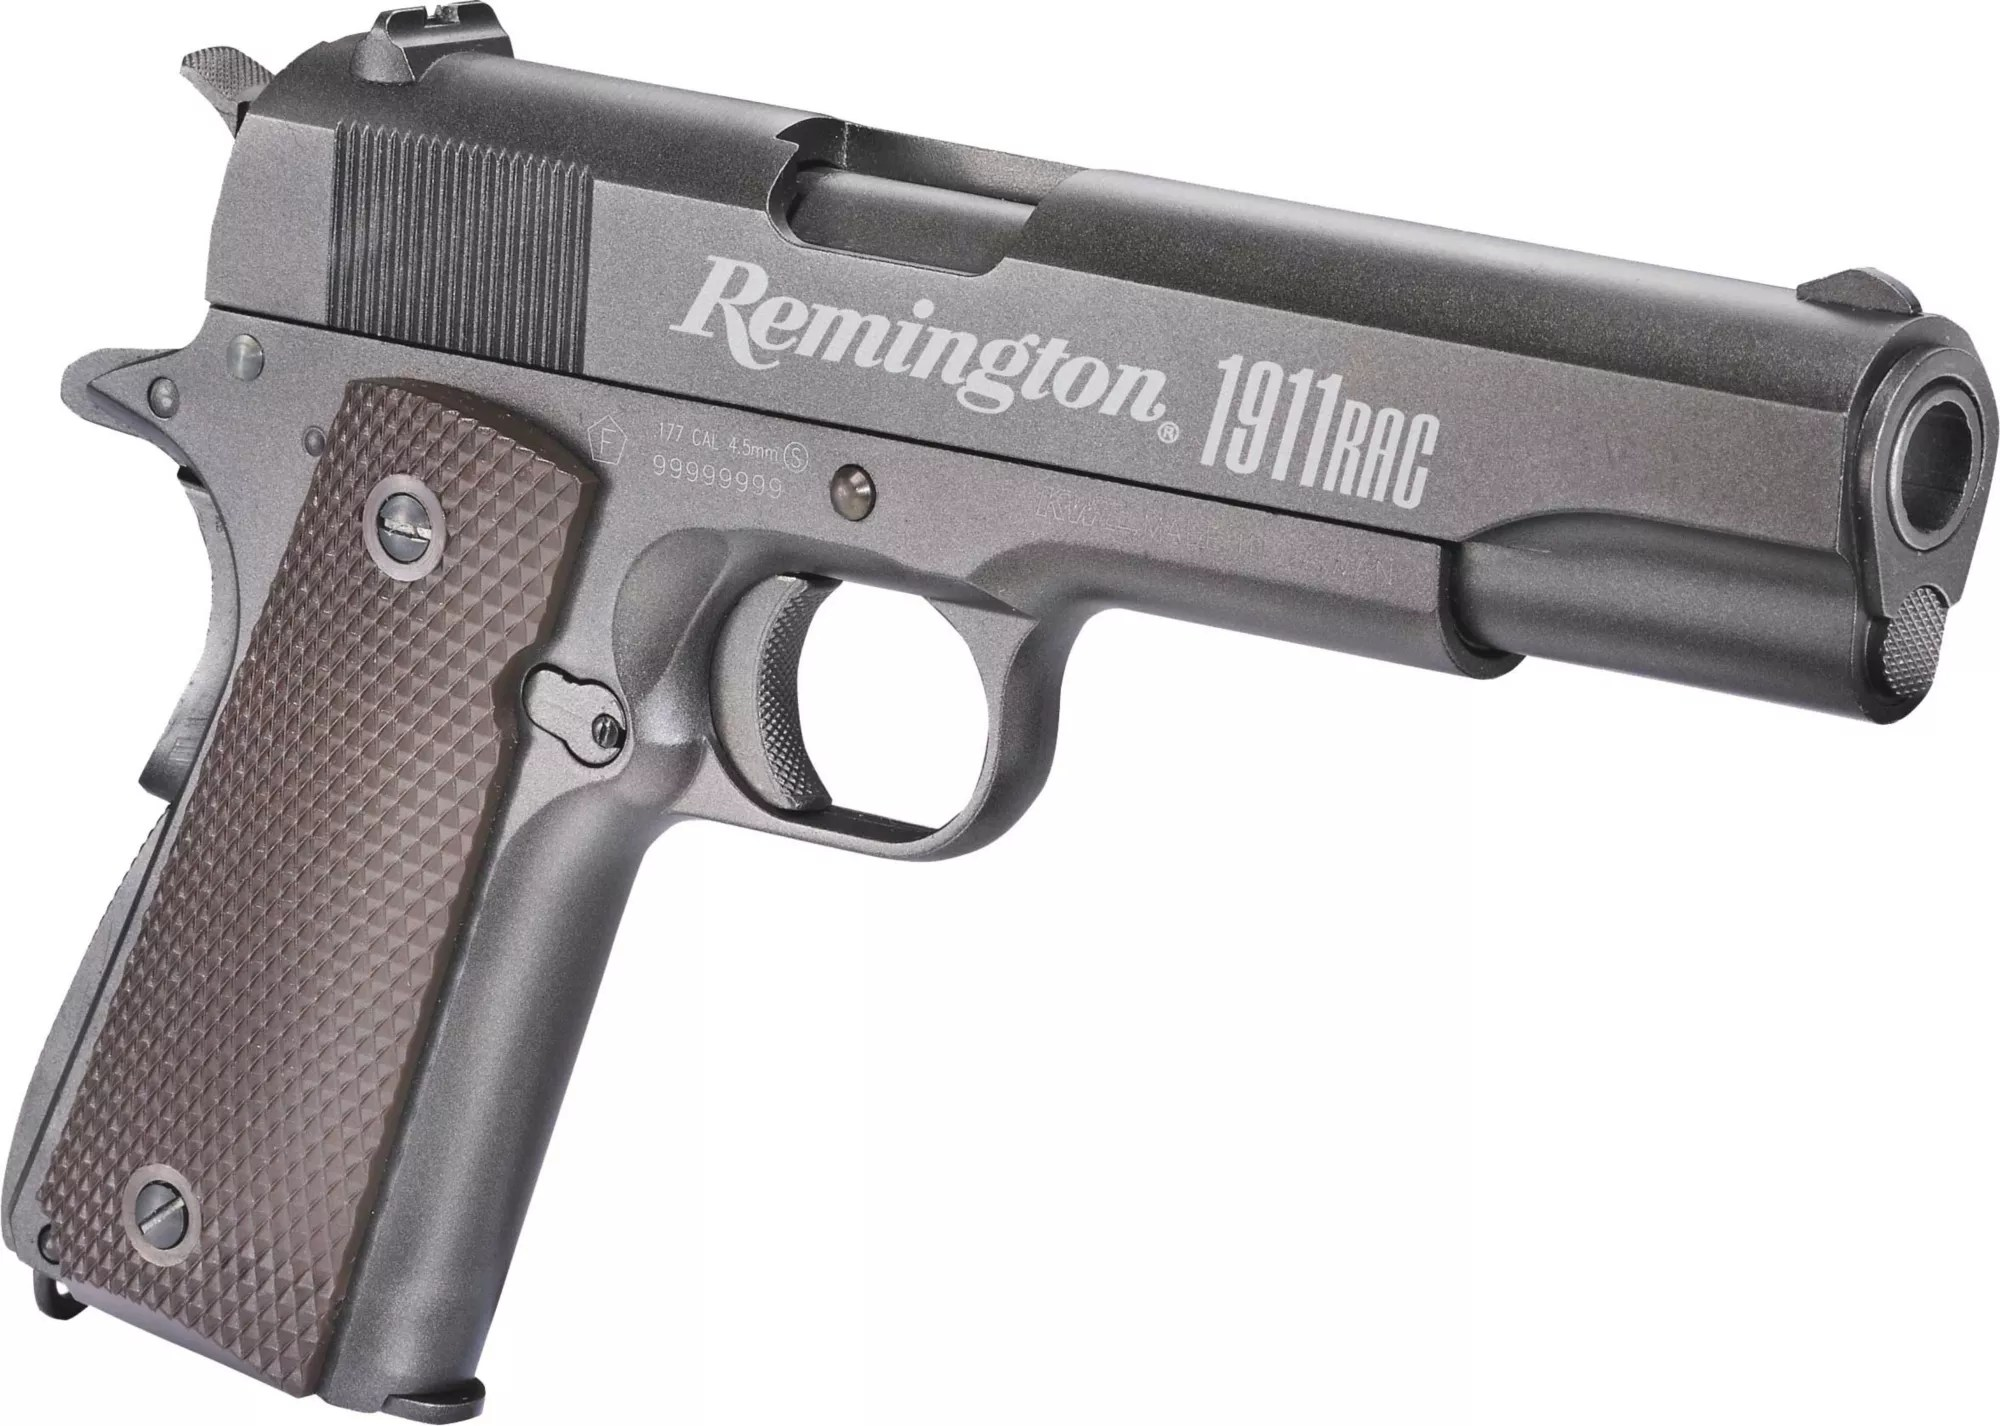 hight resolution of remington 1911rac blowback bb gun 1